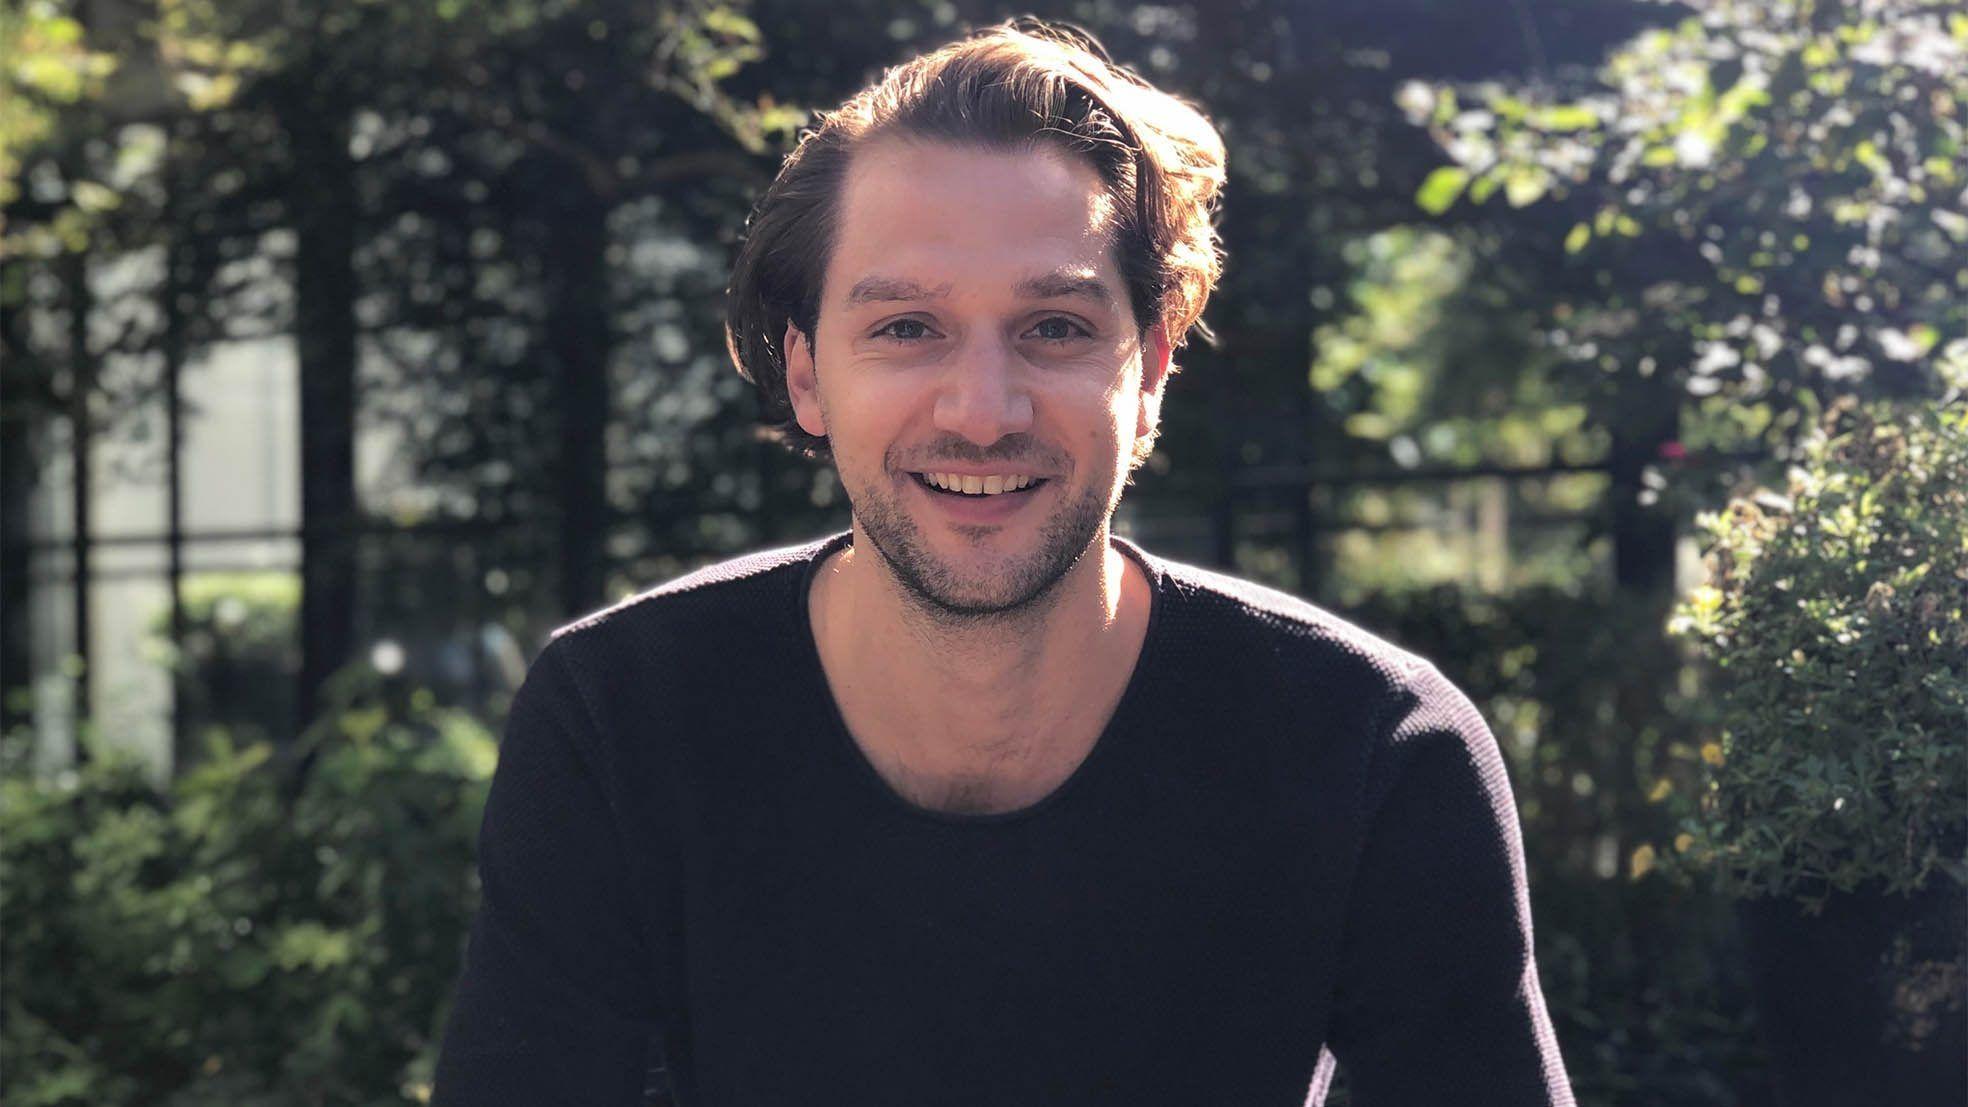 Portret Joost orderchamp